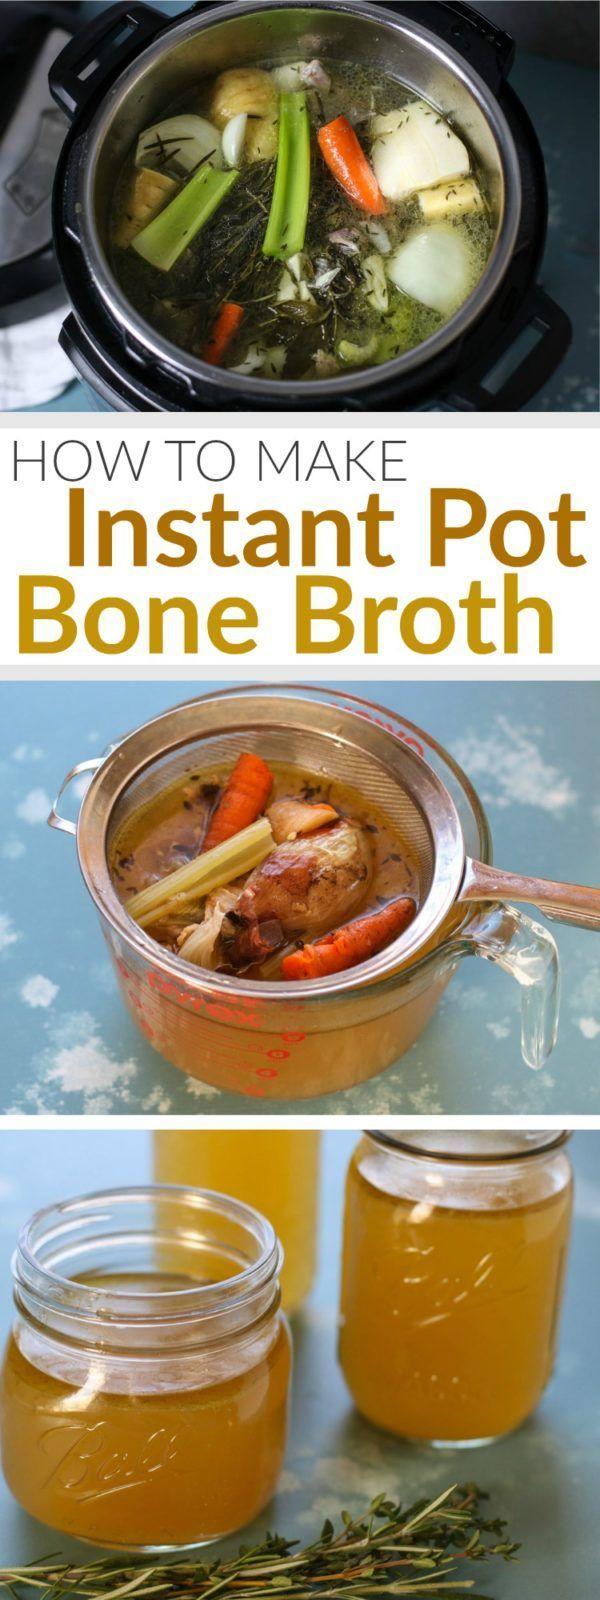 Wie man Instant Pot Bone Broth macht